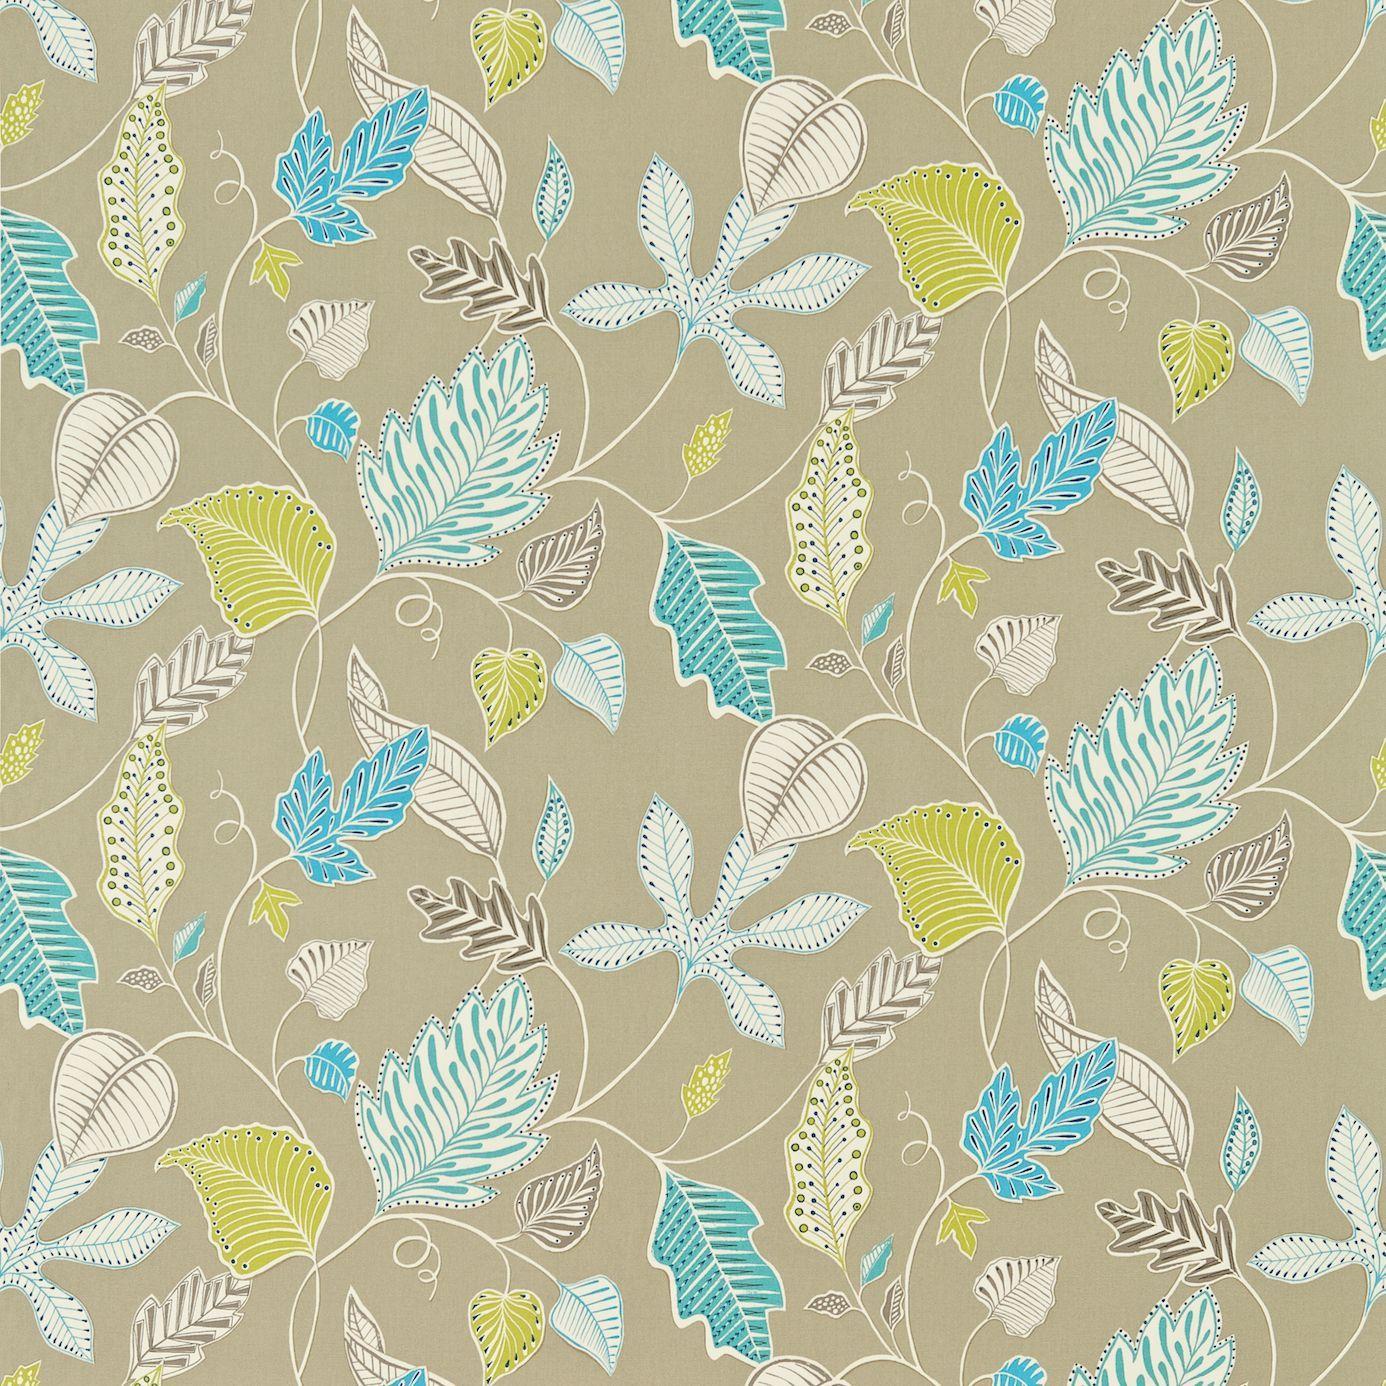 Harlequin - Details of Fabrics and Wallcovering designs Folia - Flavia